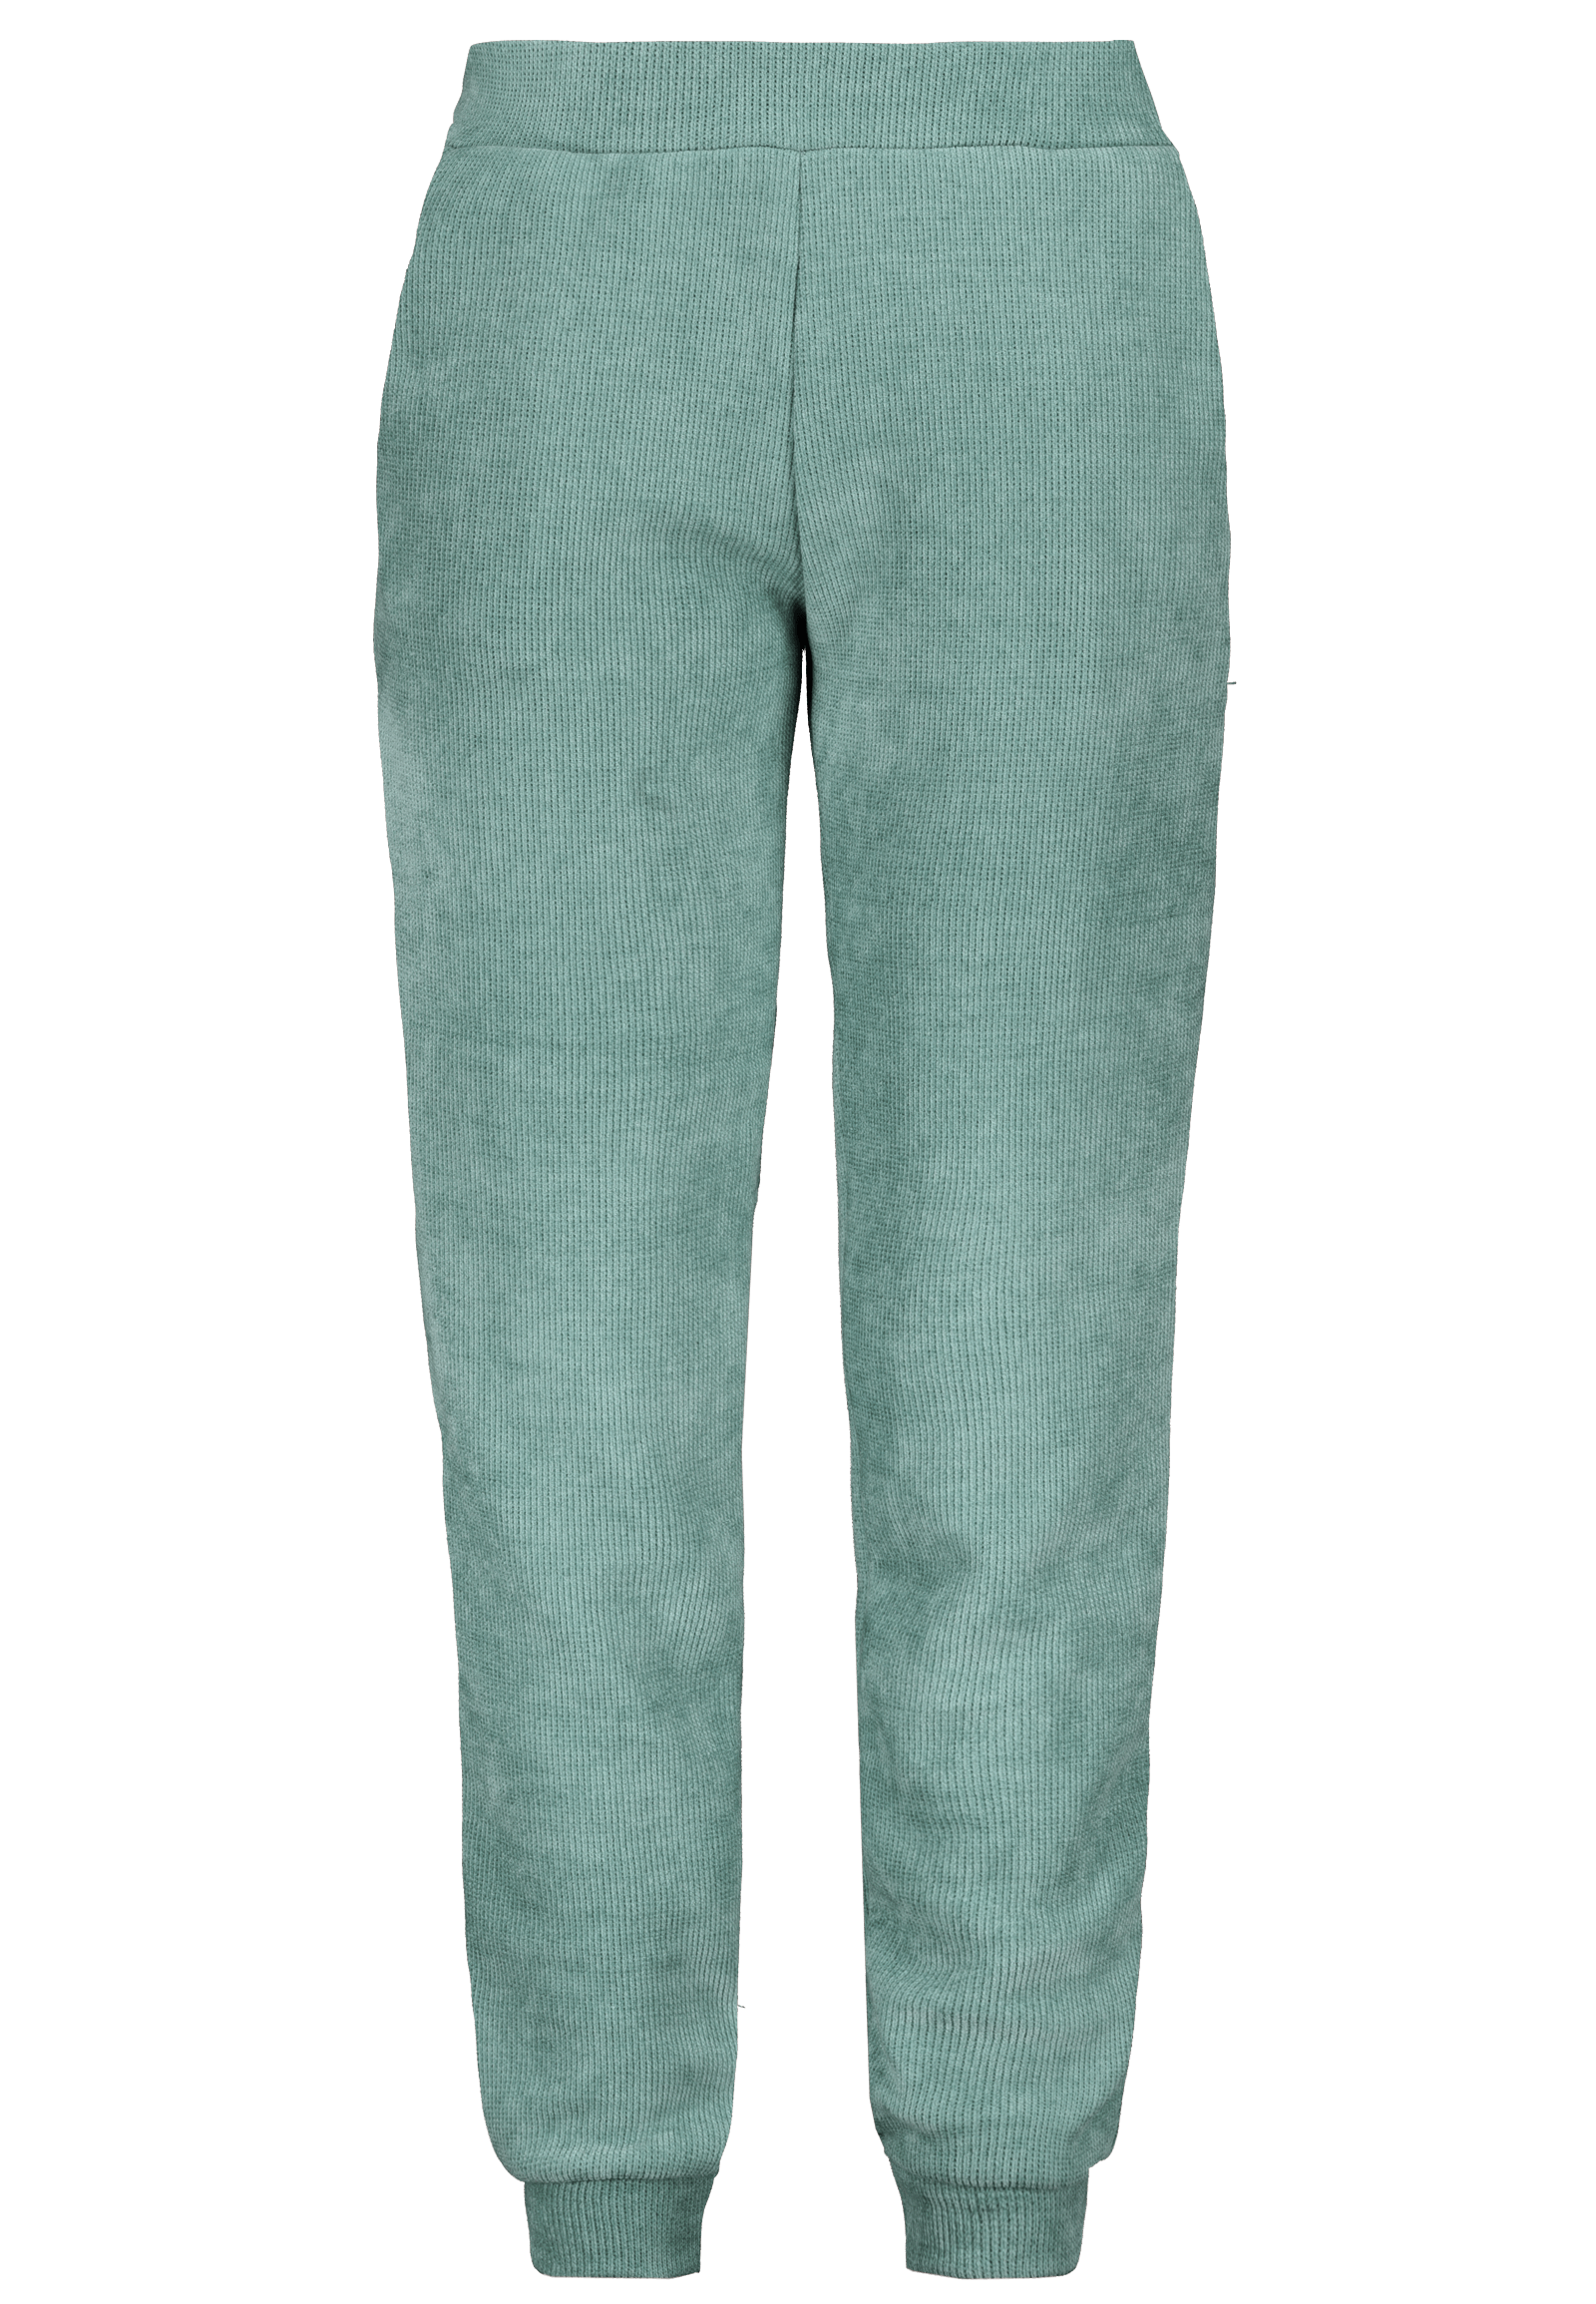 Cord-Hose Loungewear-Set